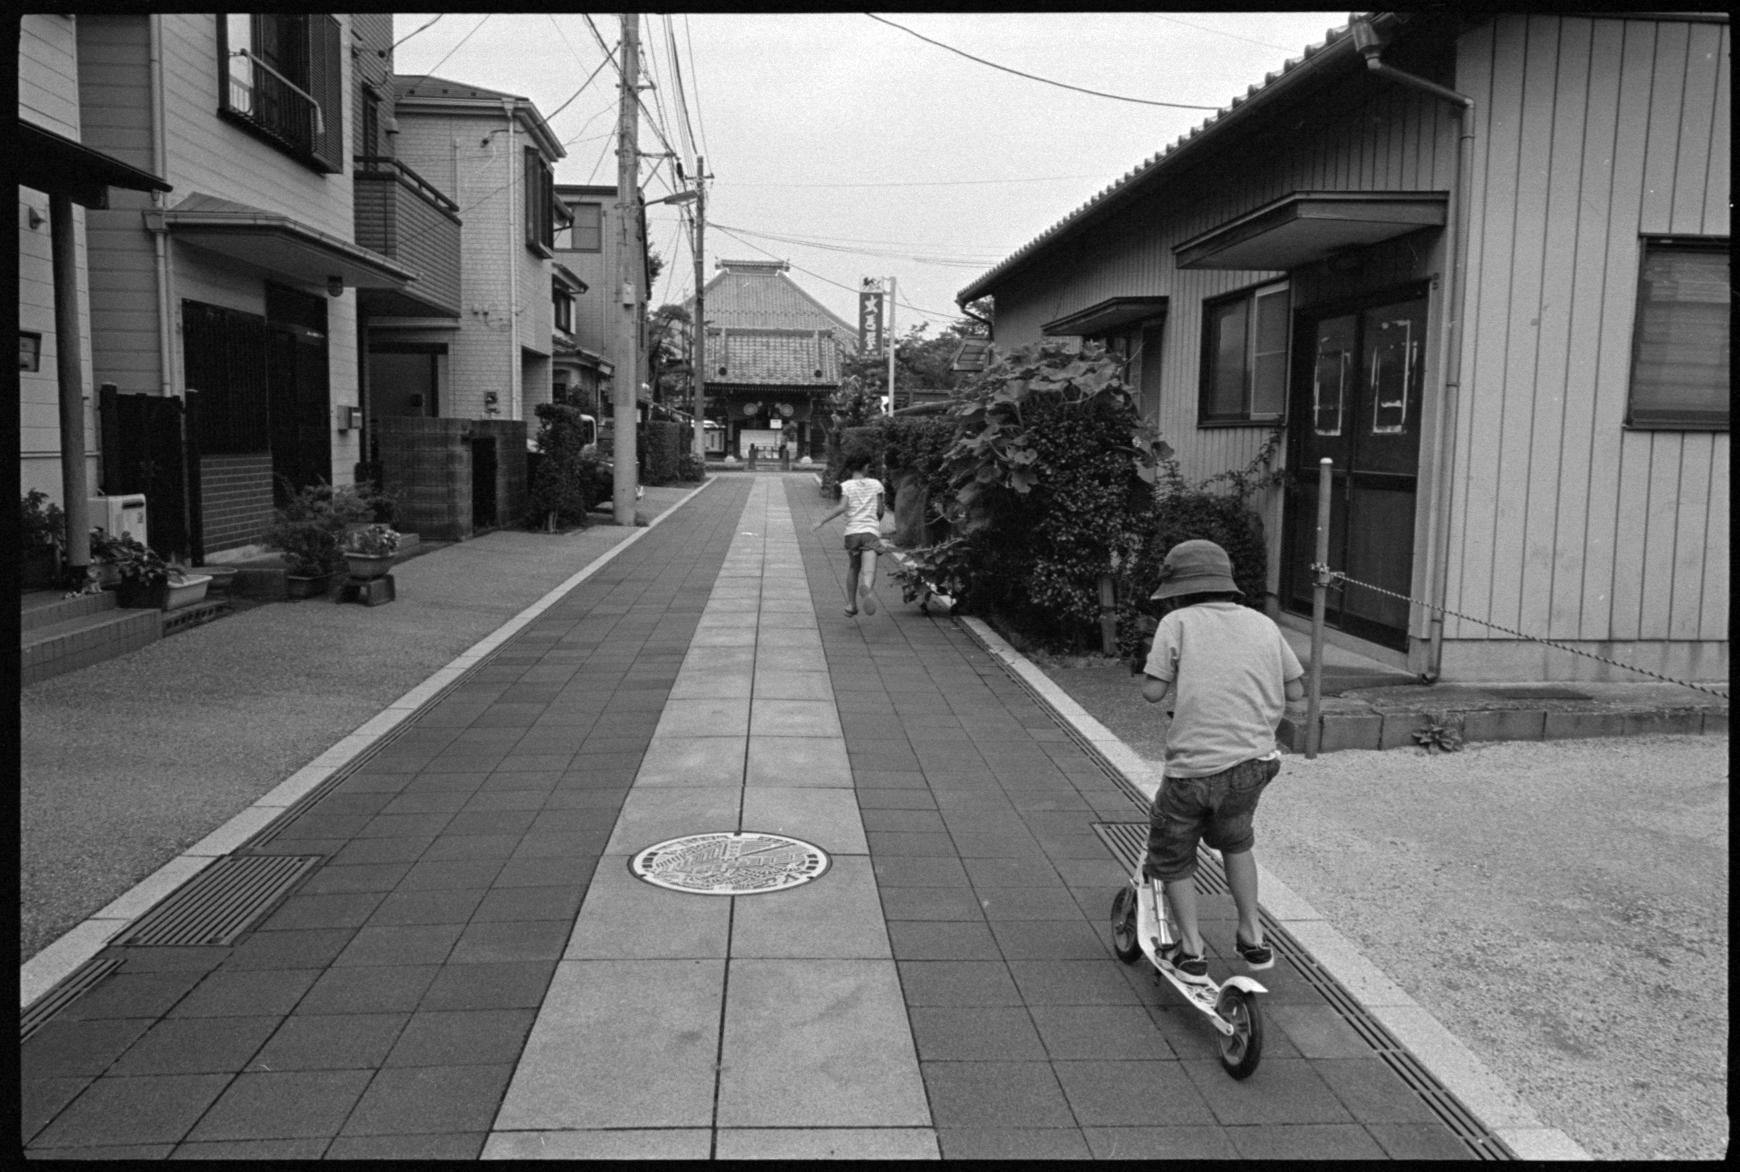 20140814 LeicaM4-P elmarit28 400TX D76 007